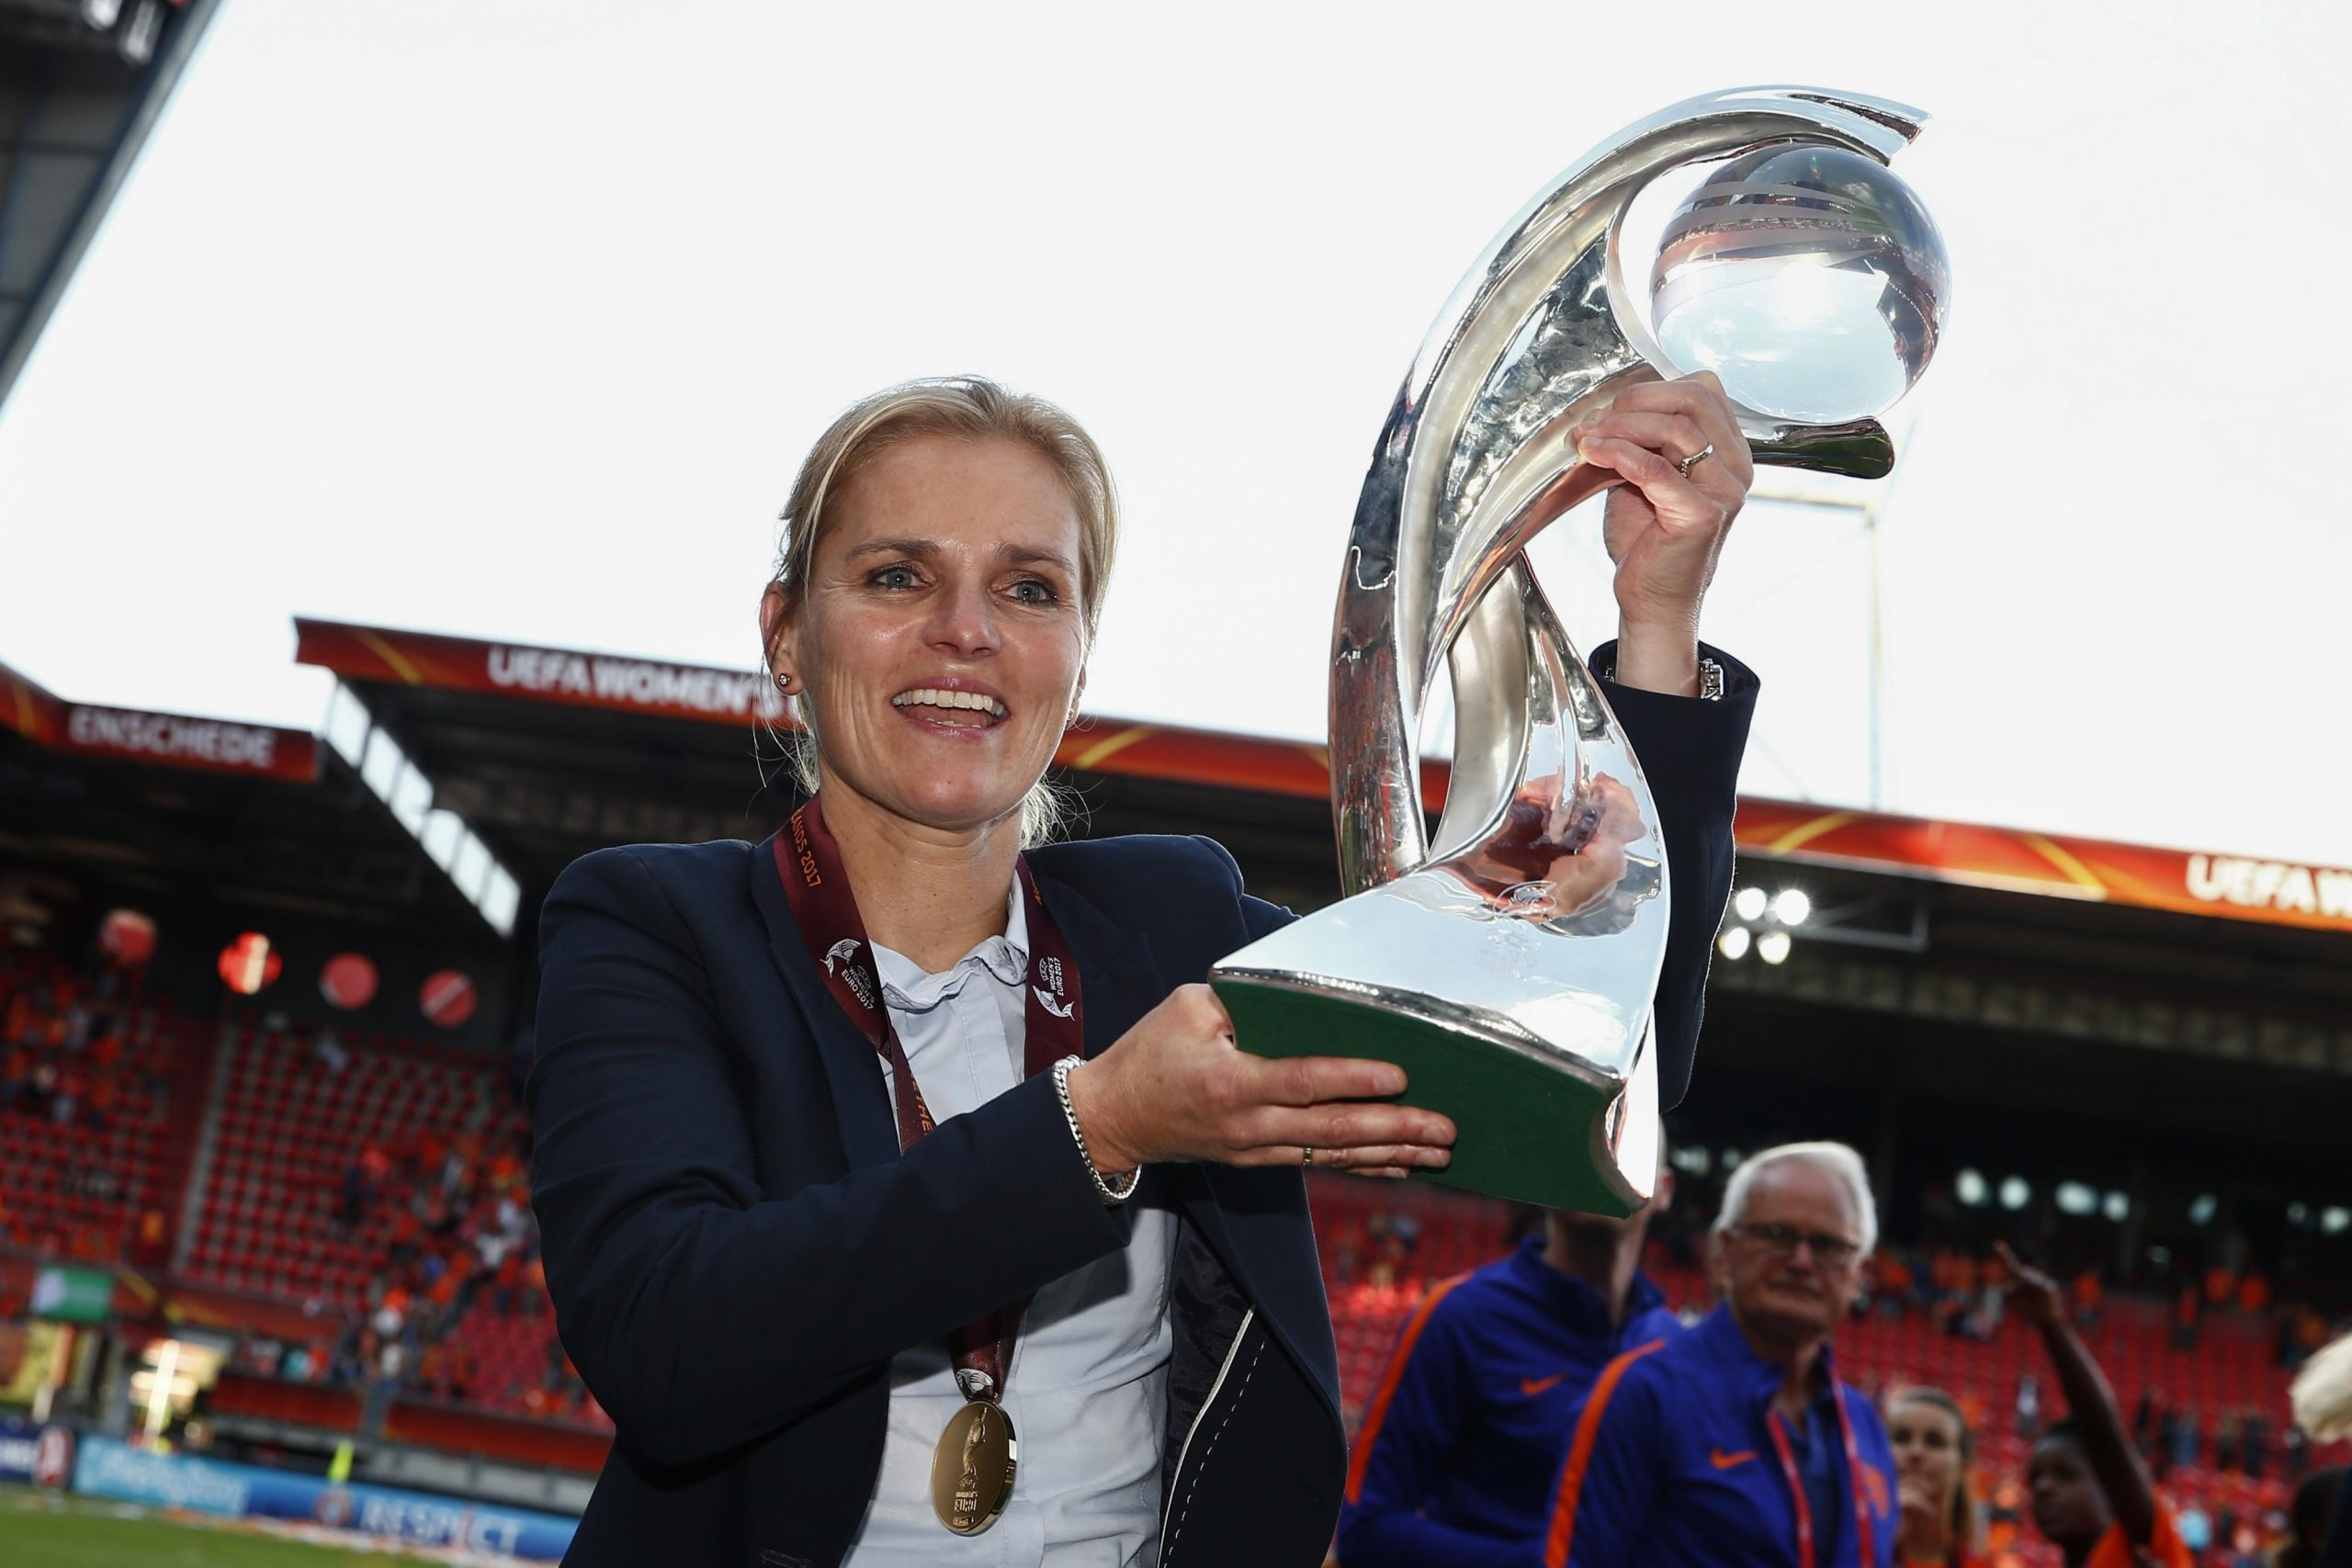 This is the successor to Sarina Wegmann, the national coach of the Dutch women's national team